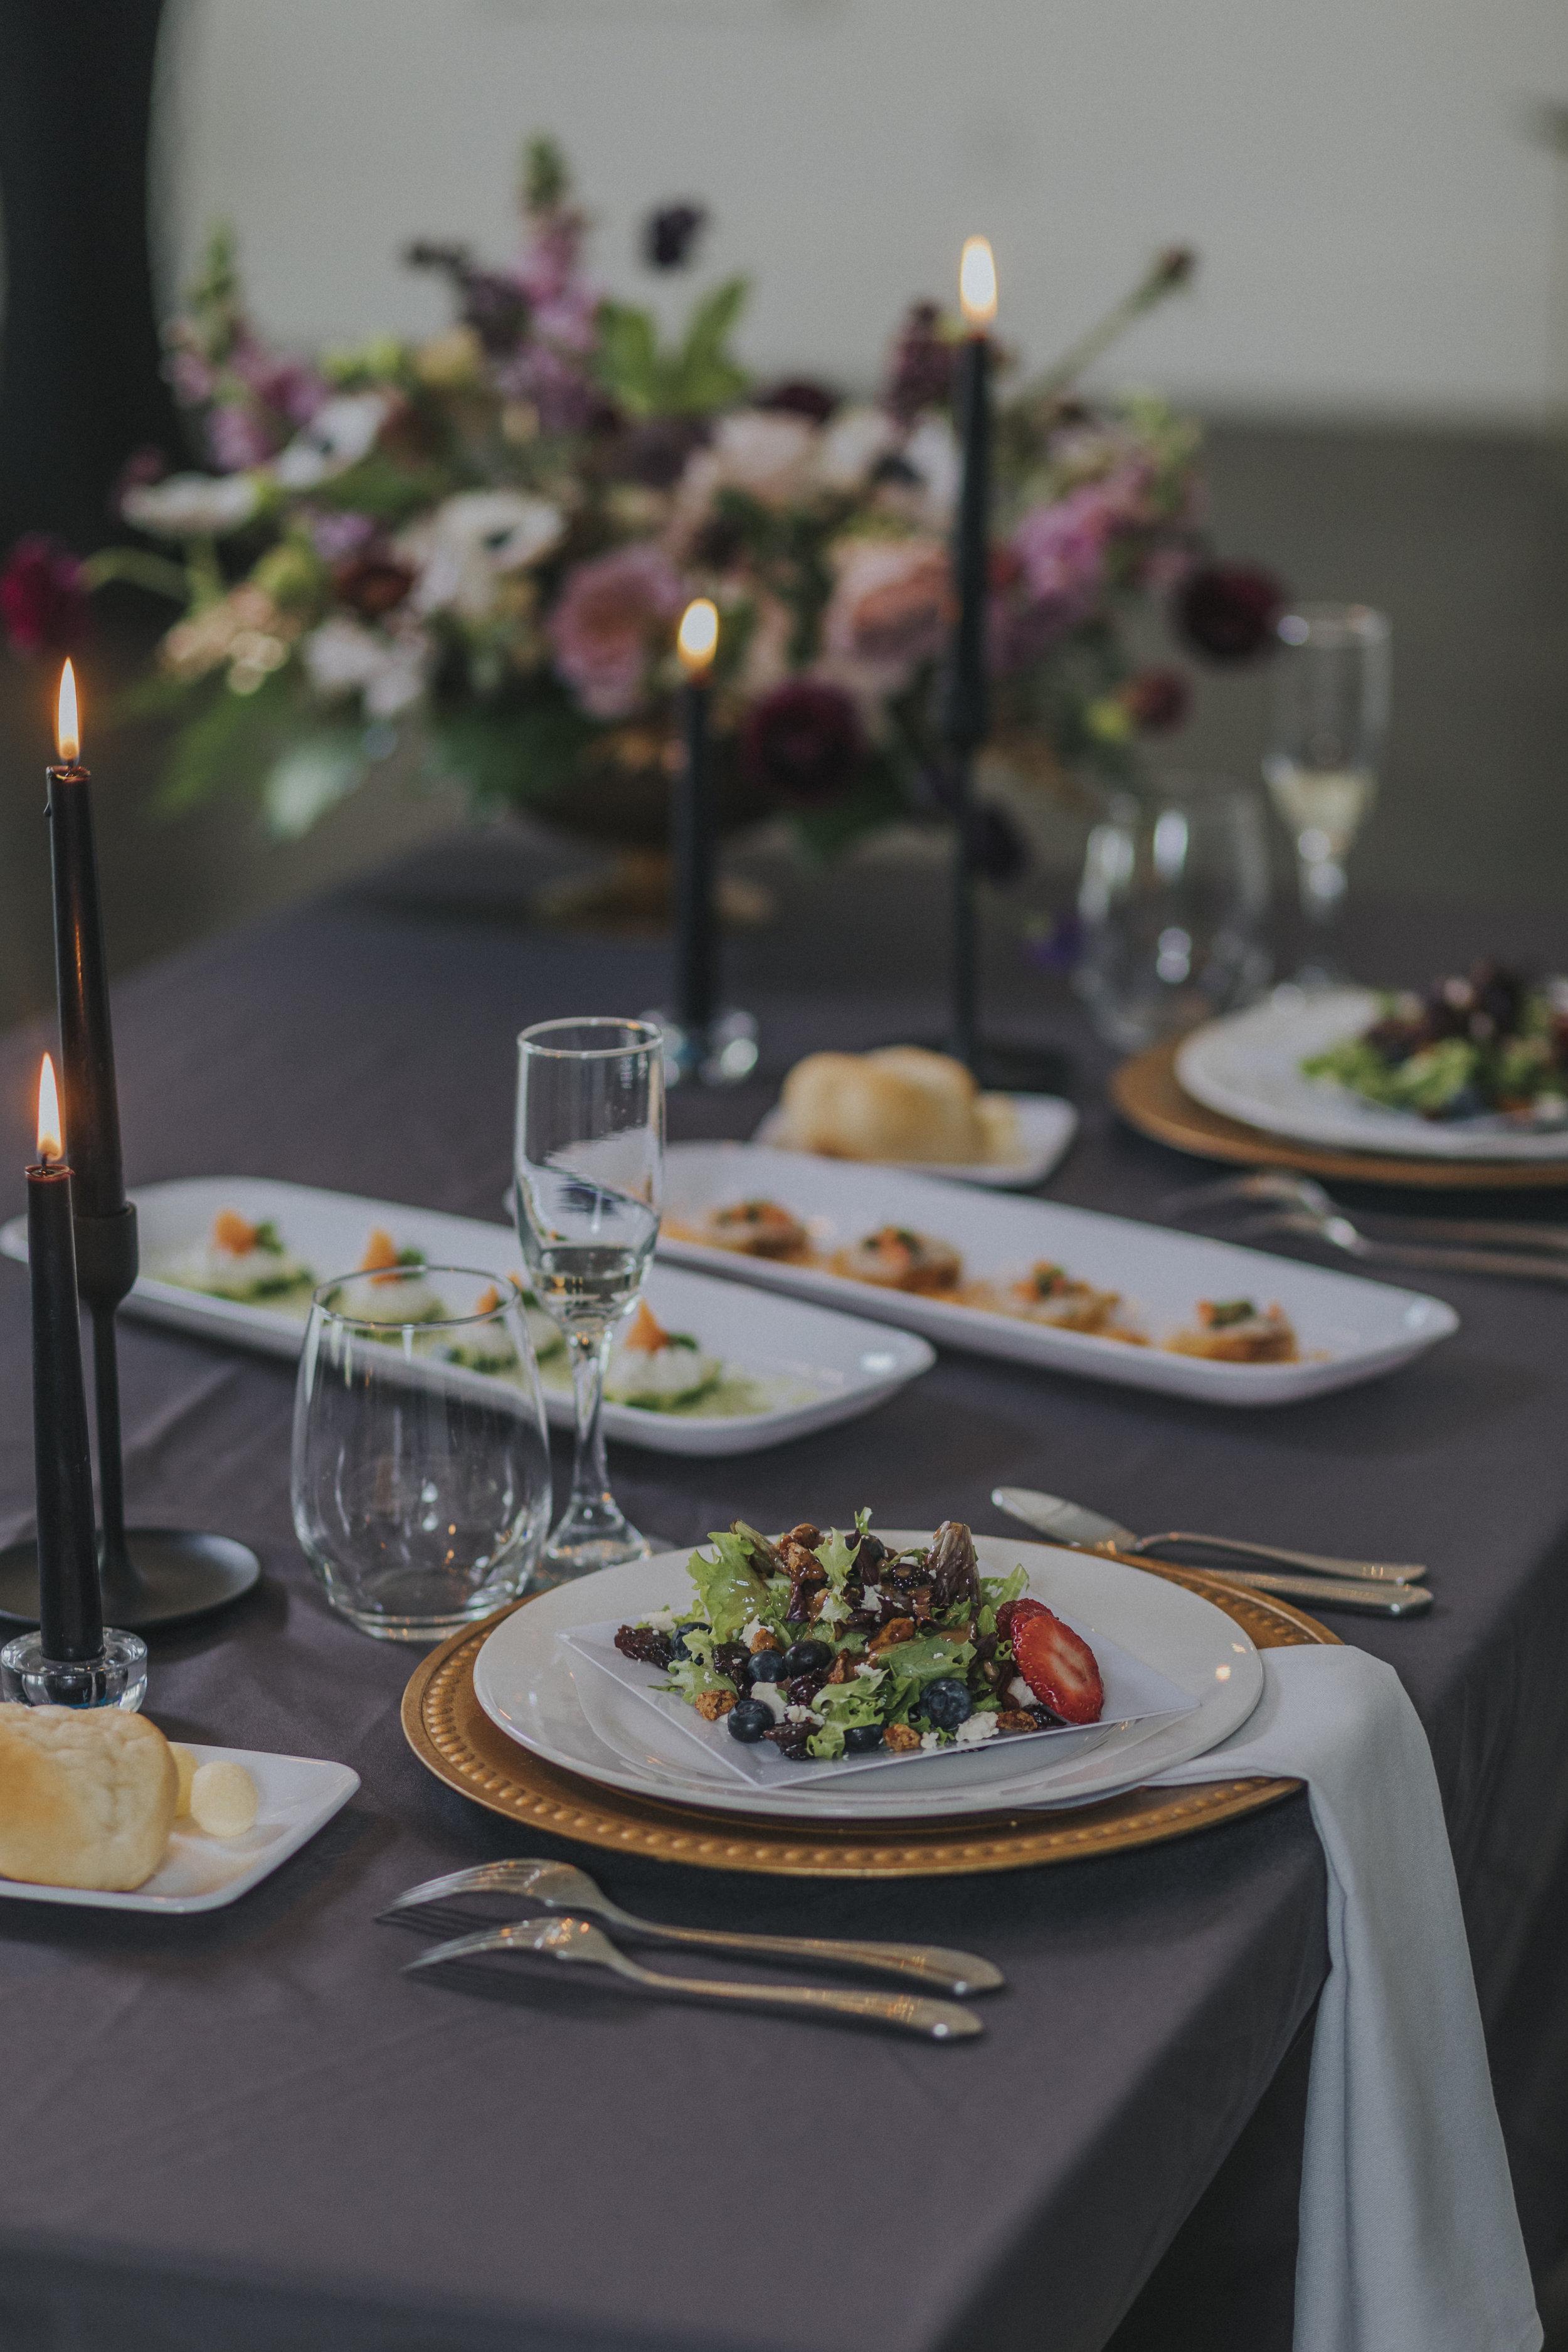 181  omaha-nebraska-empire-room-tiny-luxe-wedding-planner.jpg